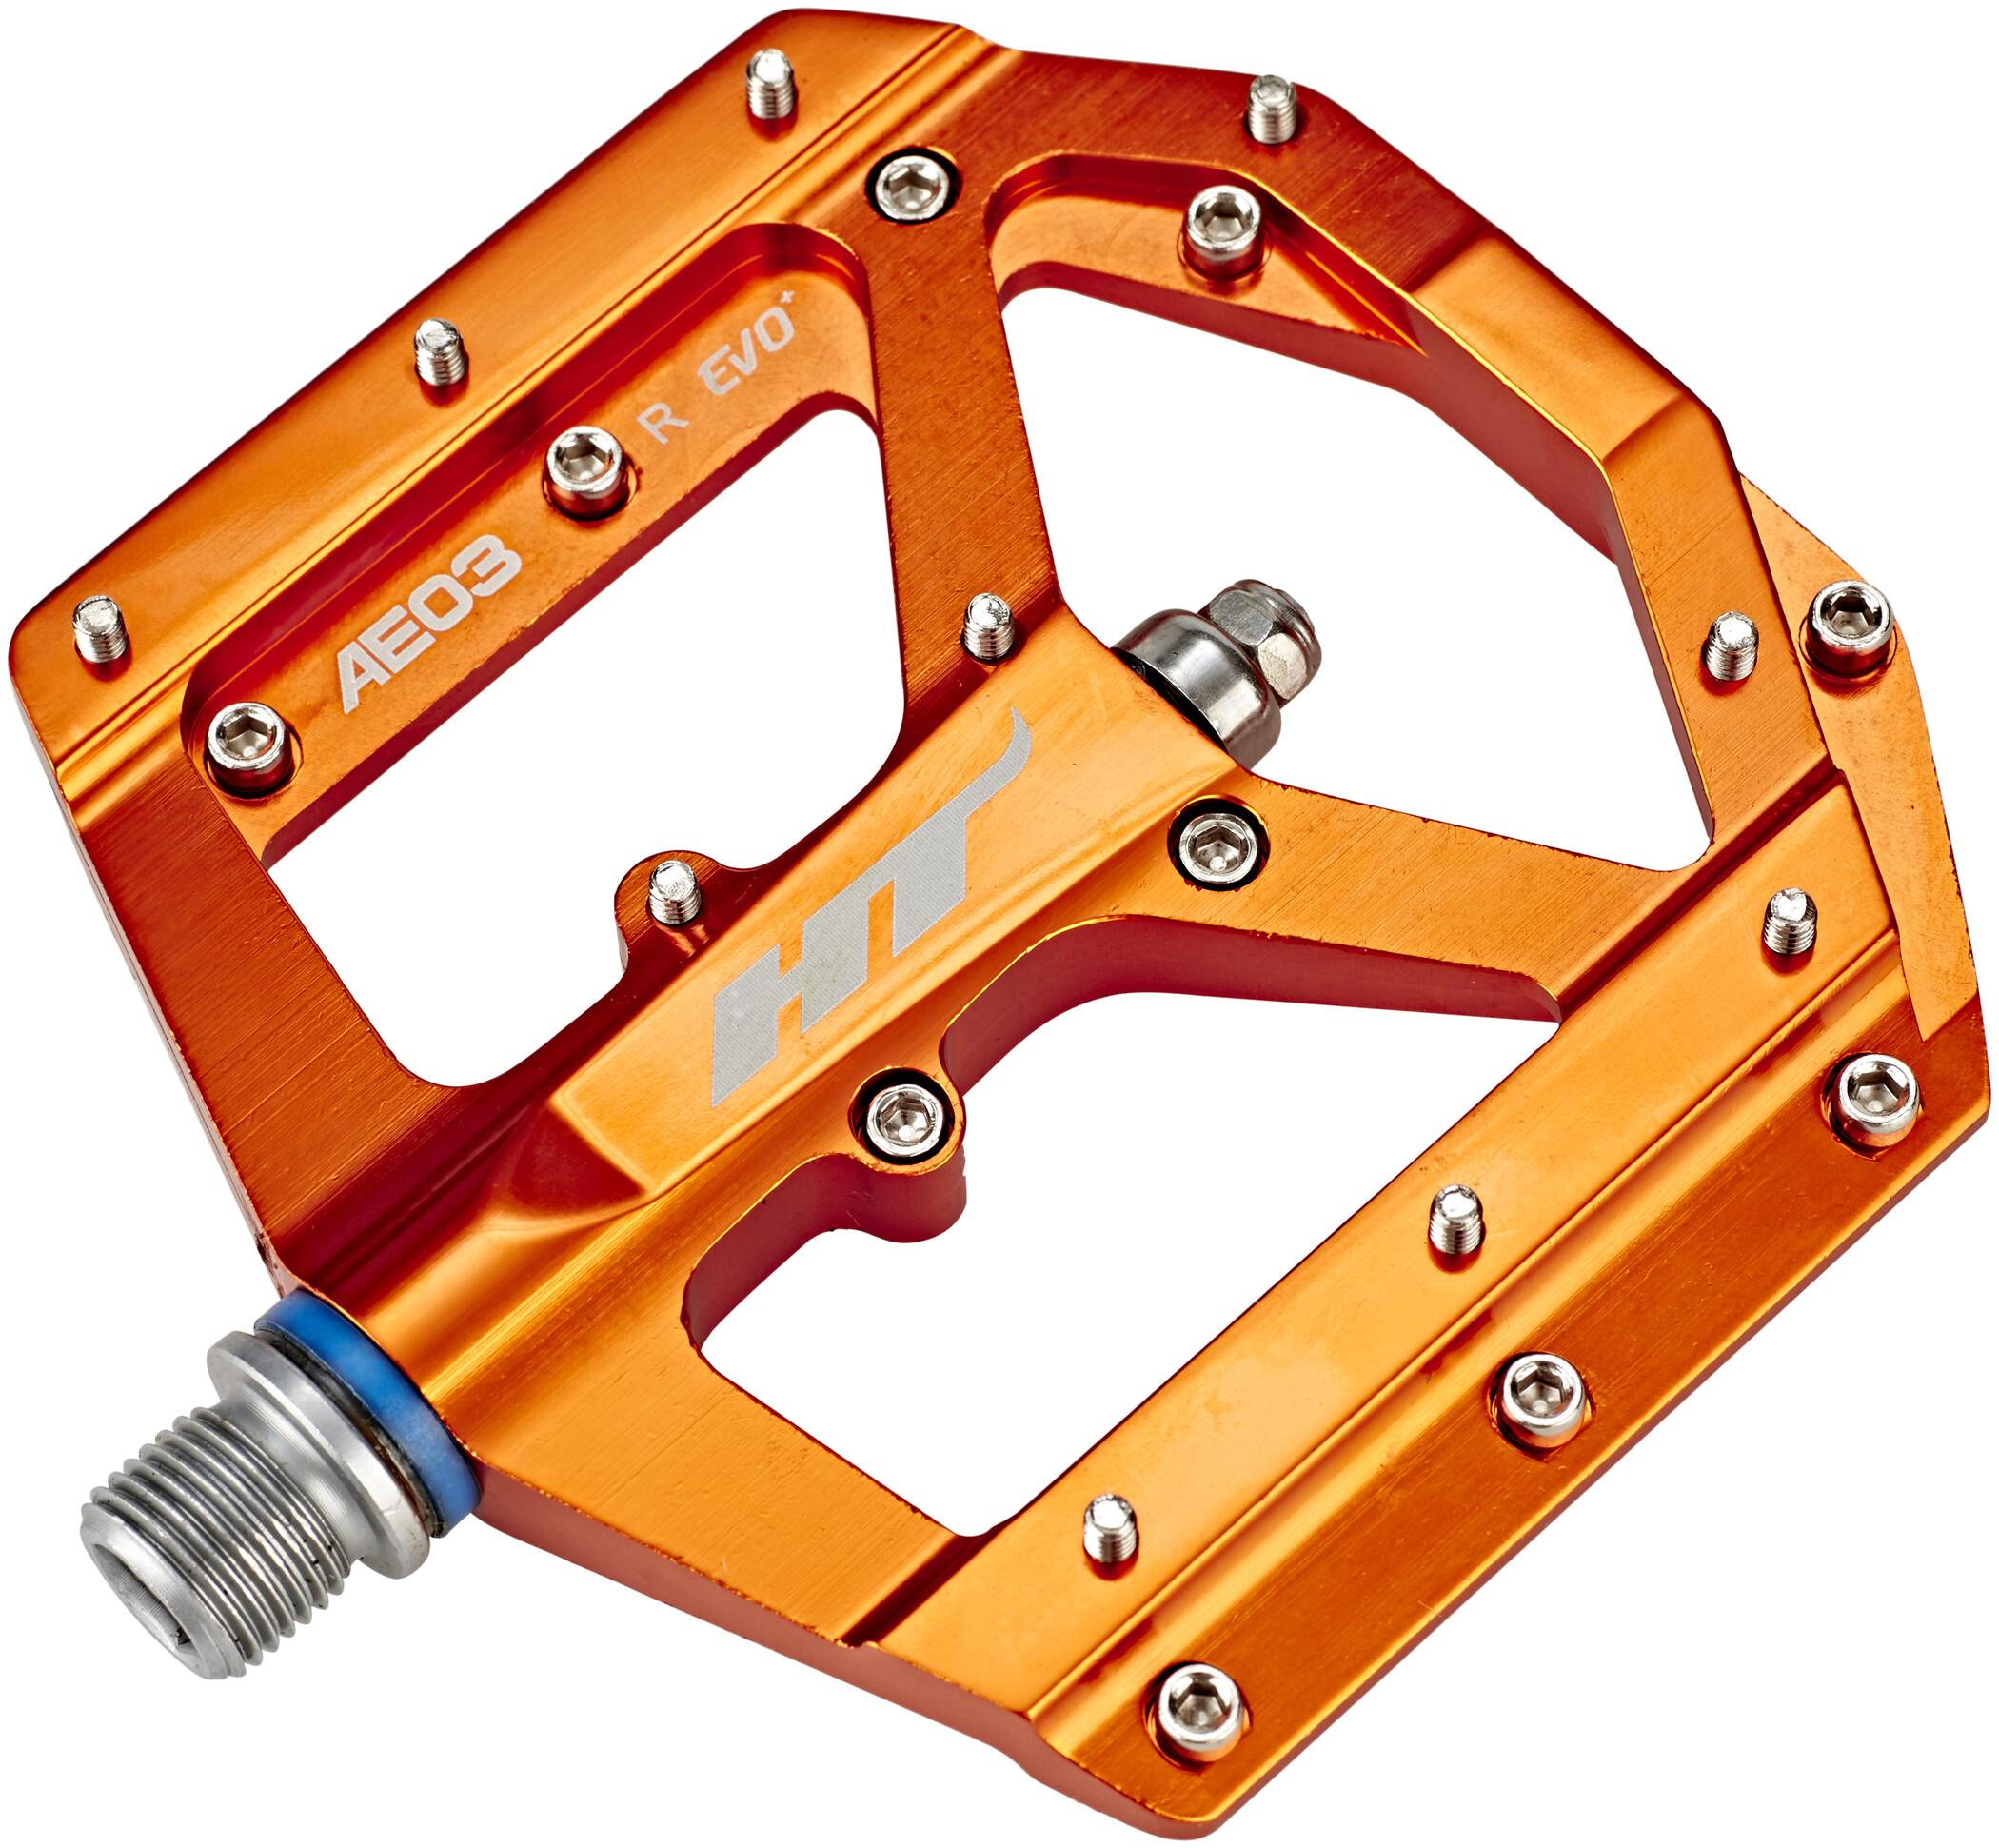 HT AE03 EVOFlat-pedaler, orange (2019) | Pedaler